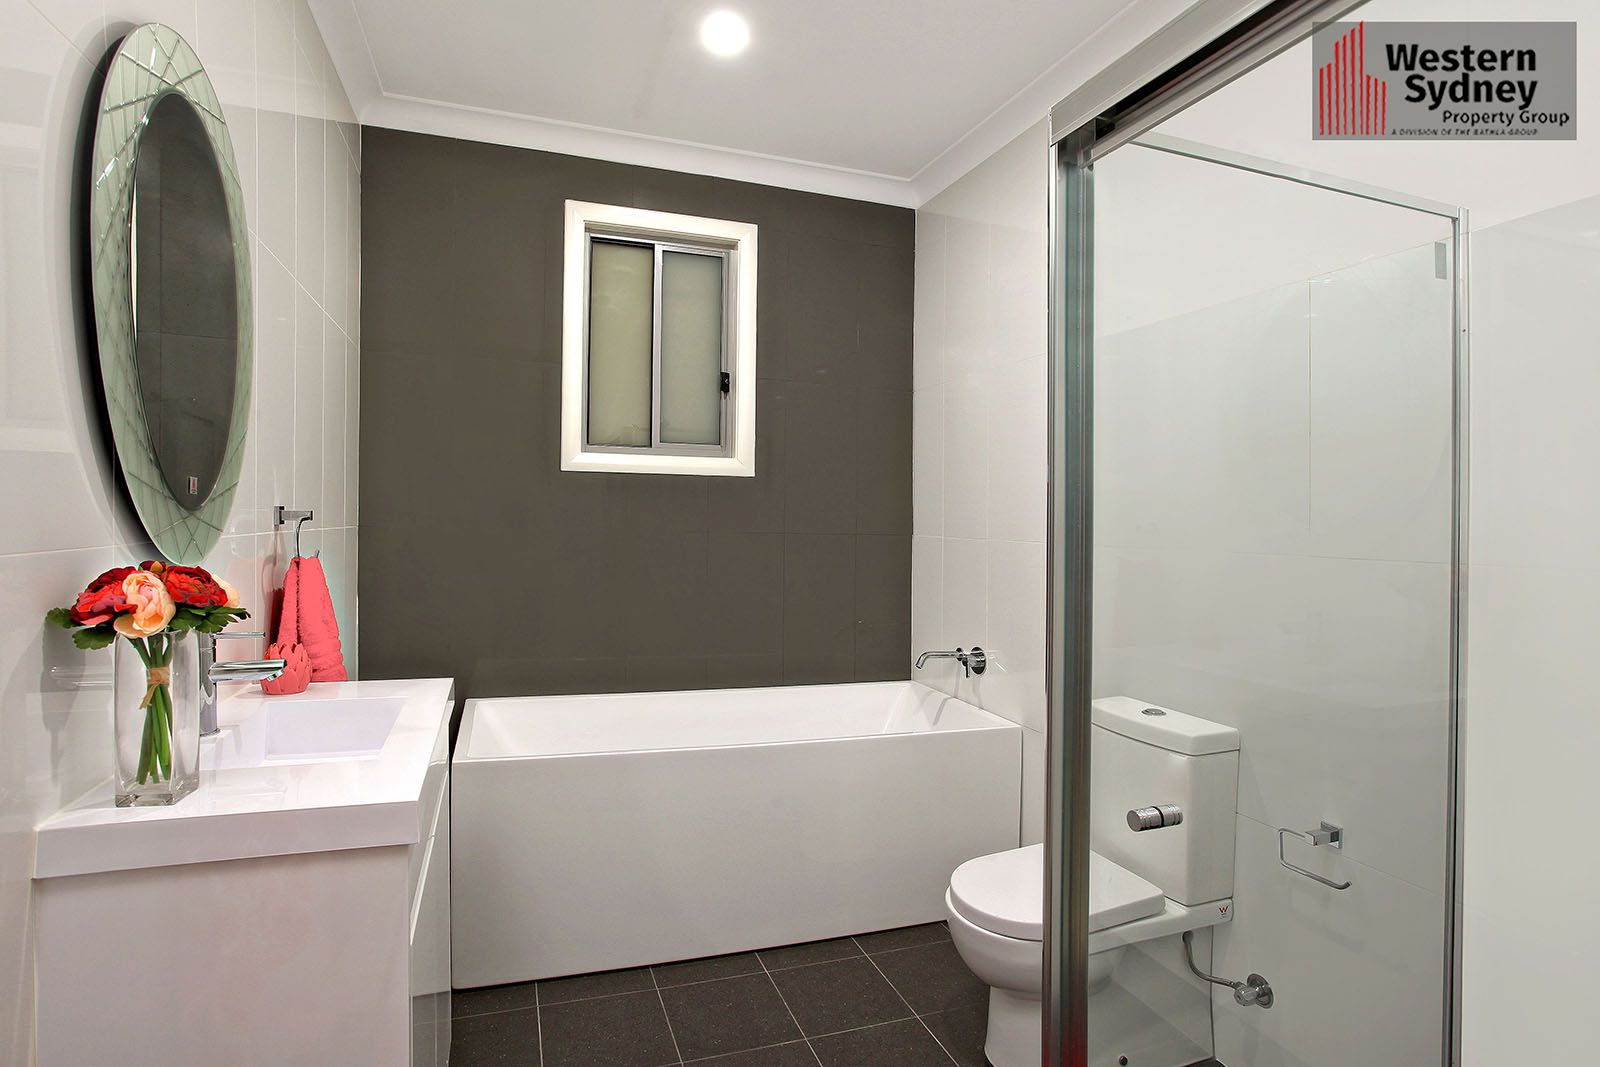 TH 22/84 CRANBOURNE STREET, Riverstone NSW 2765, Image 1